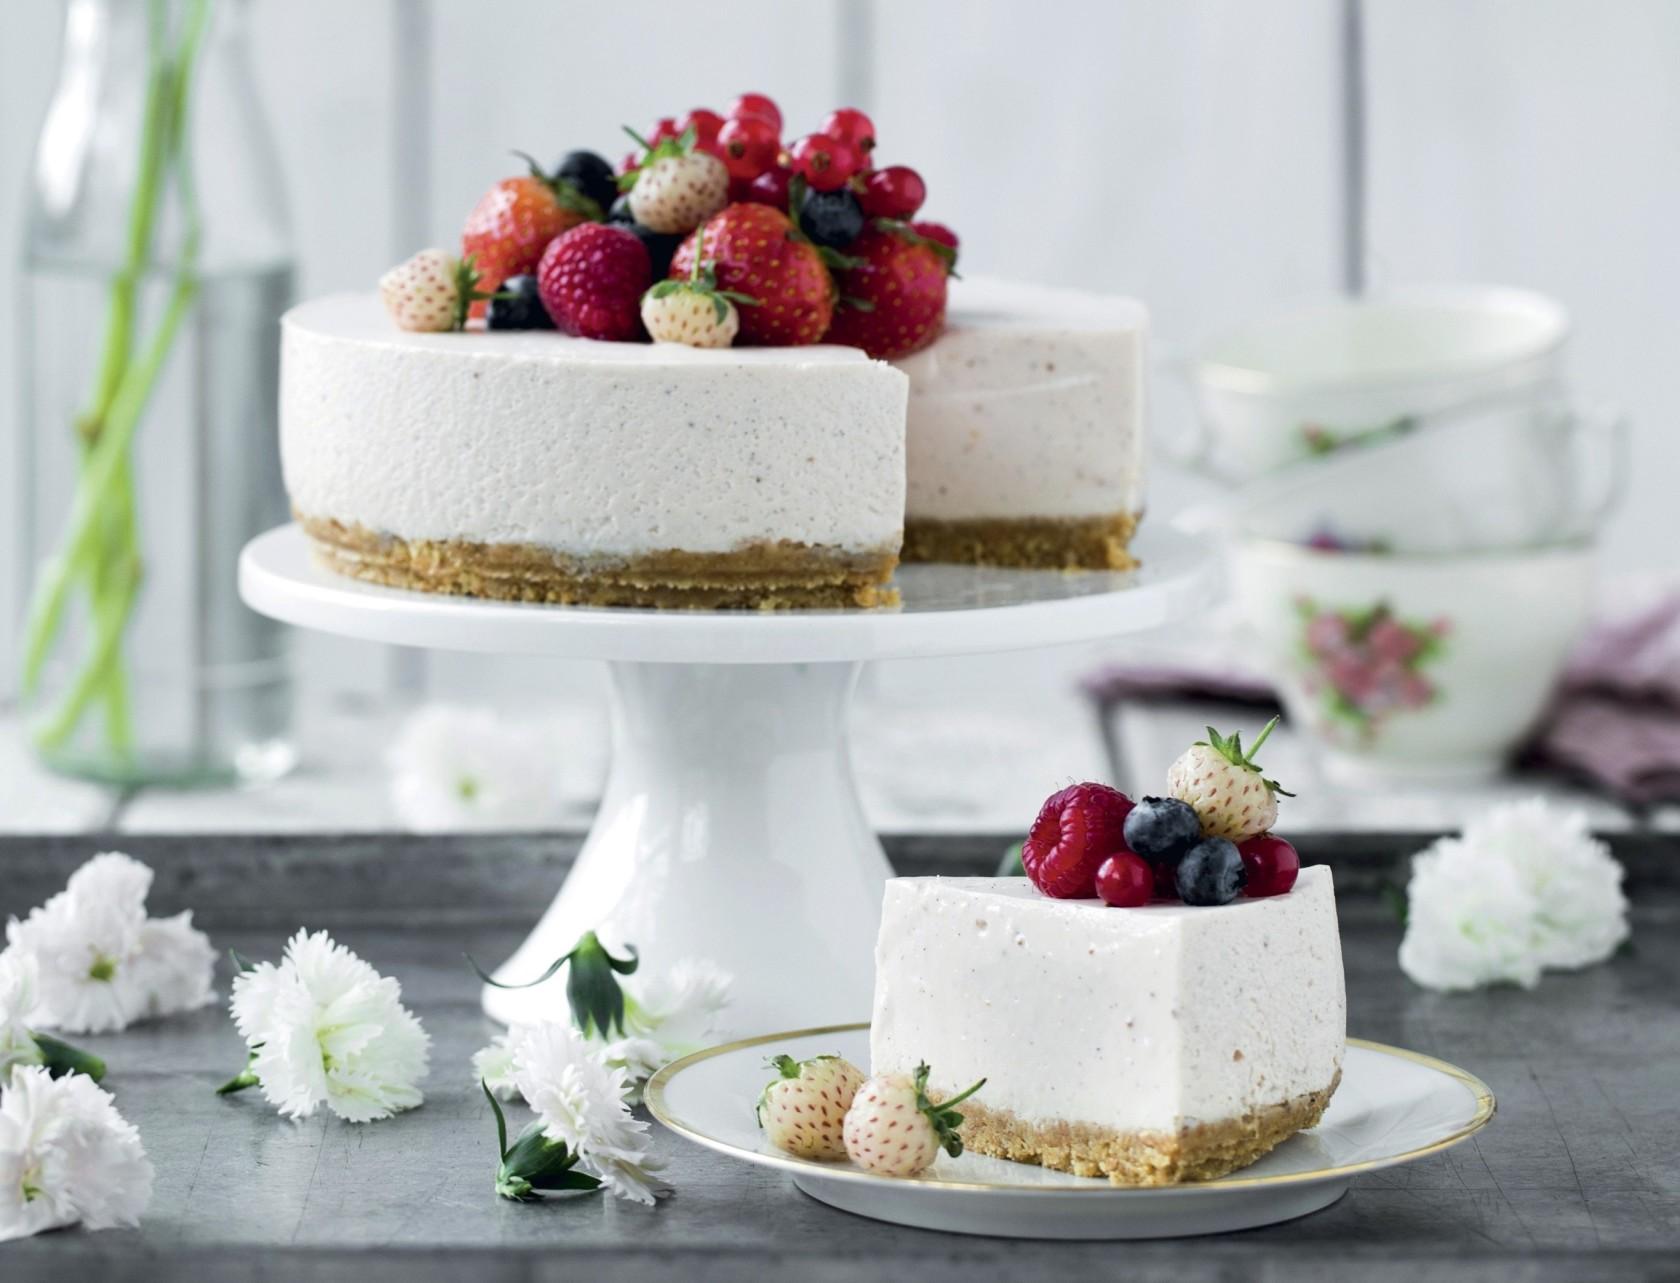 Jordbærcheesecake med bær - den bedste opskrift!